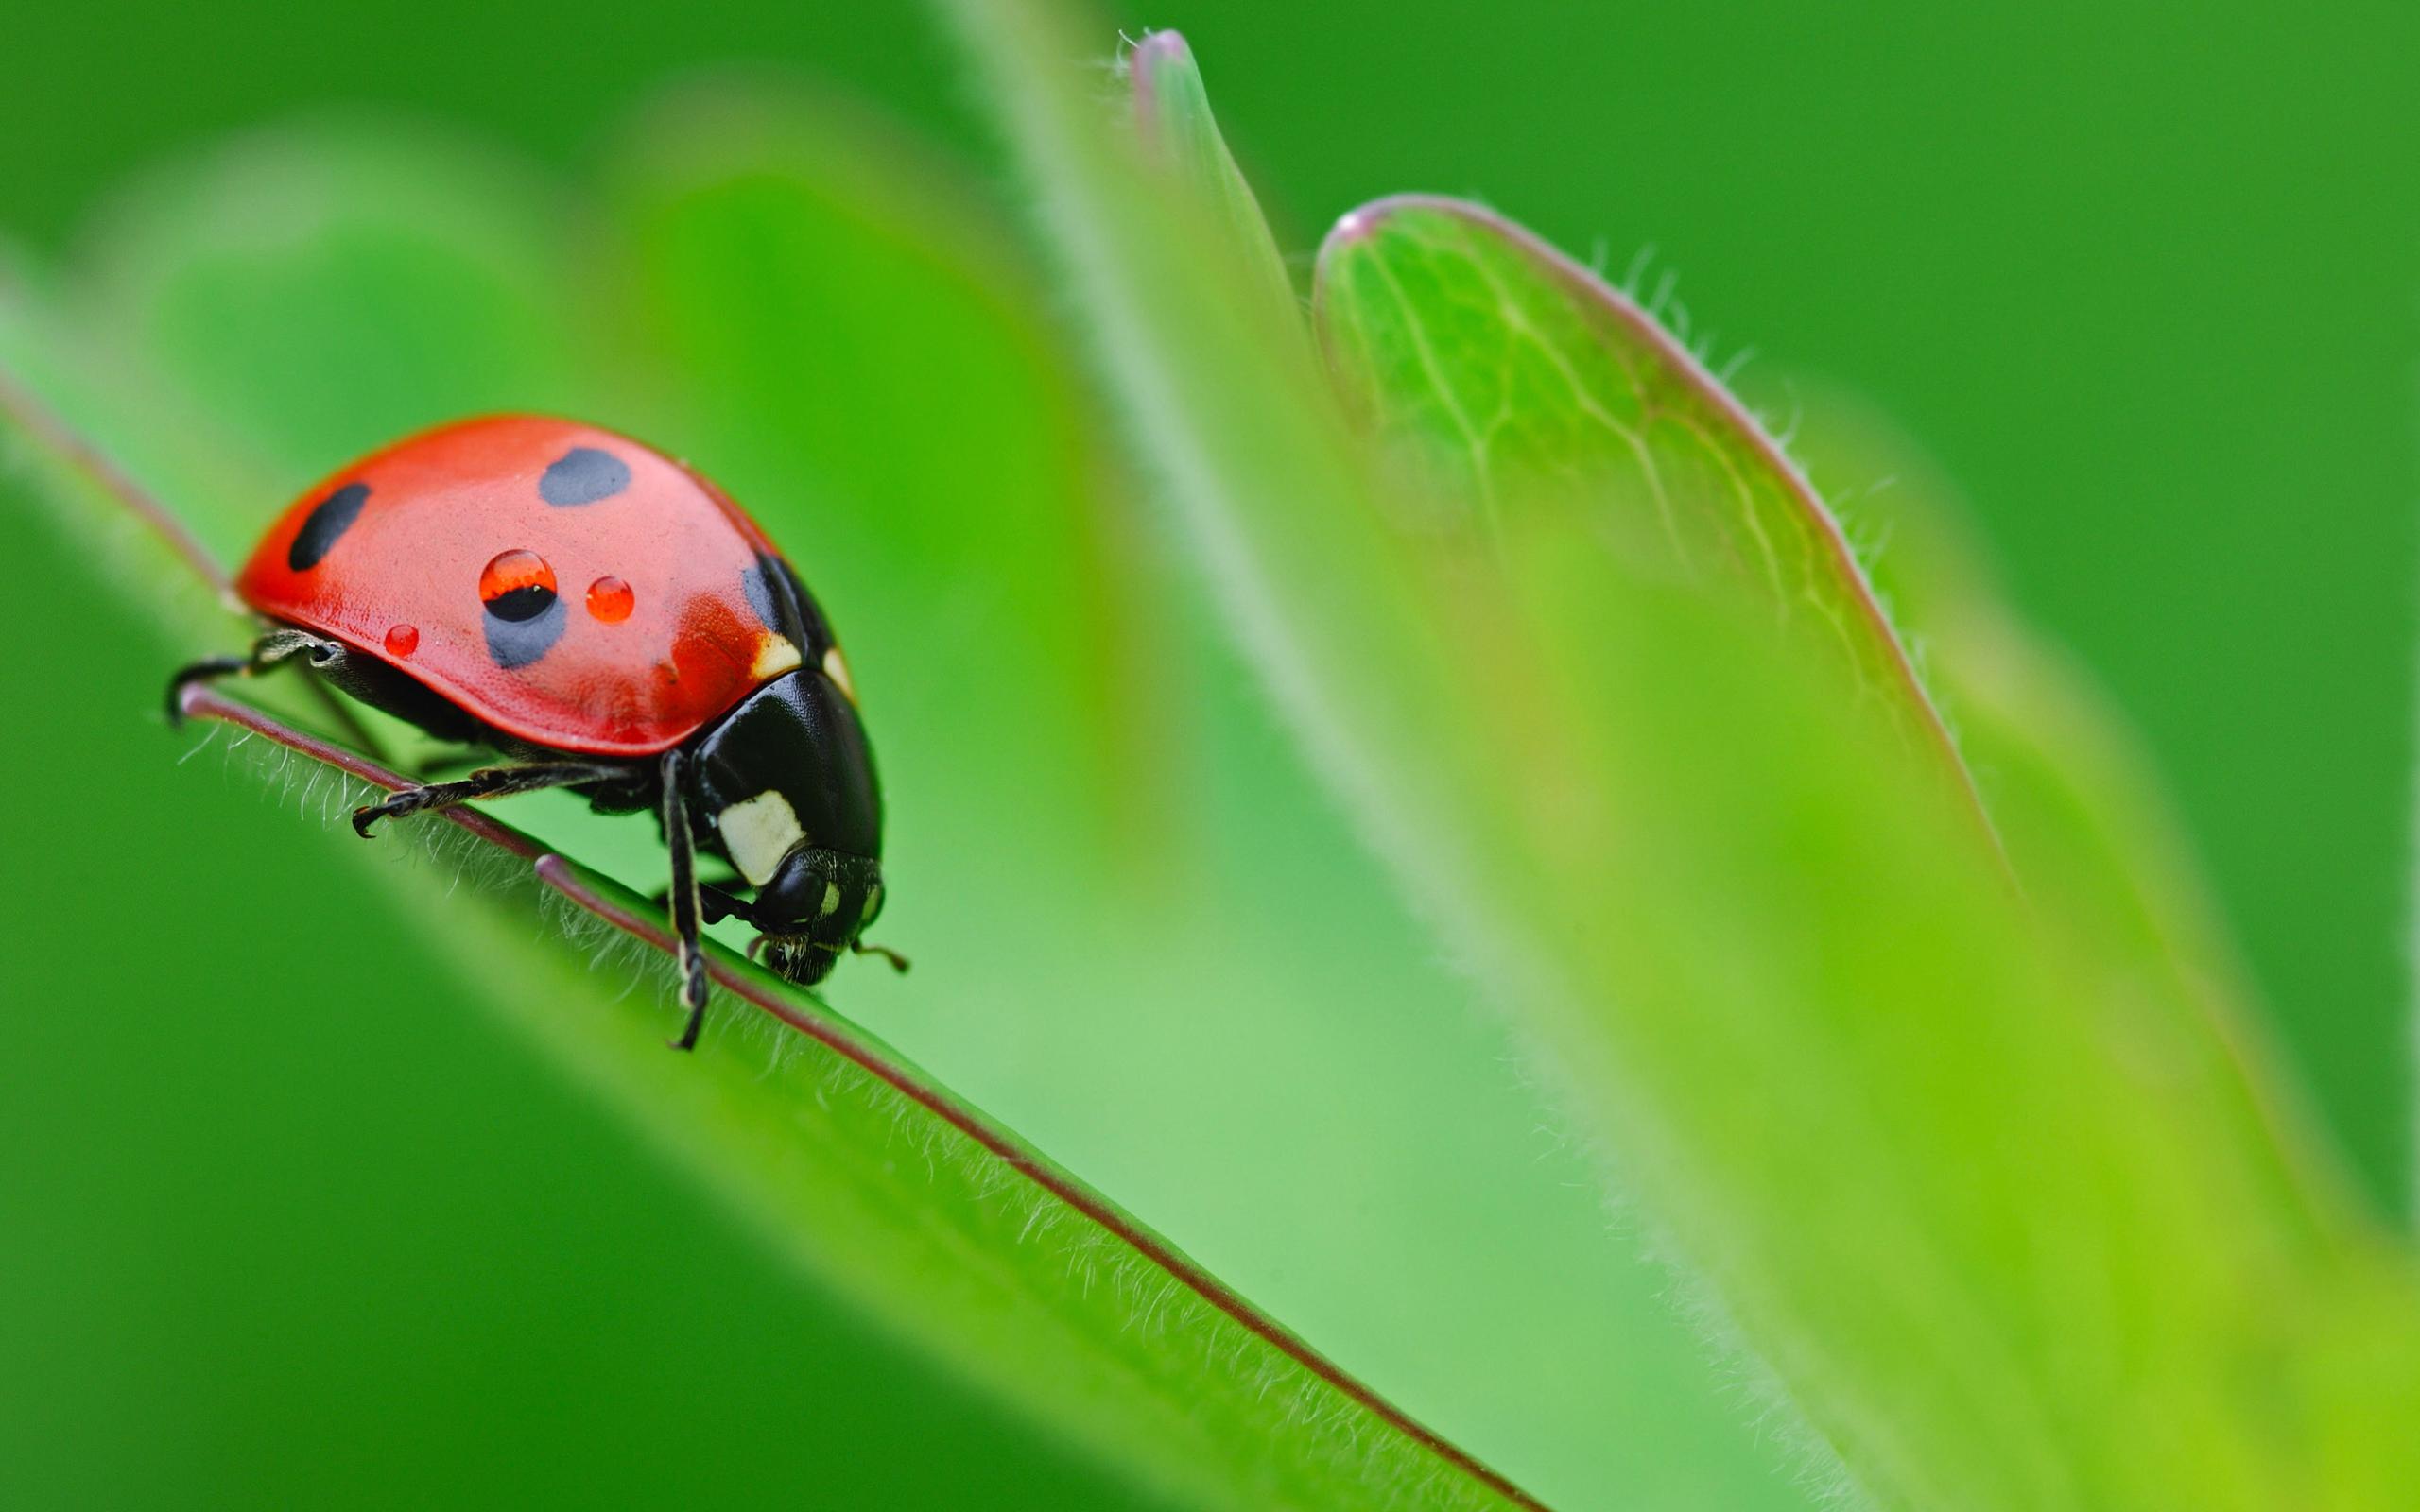 Ladybug Insect Wallpaper